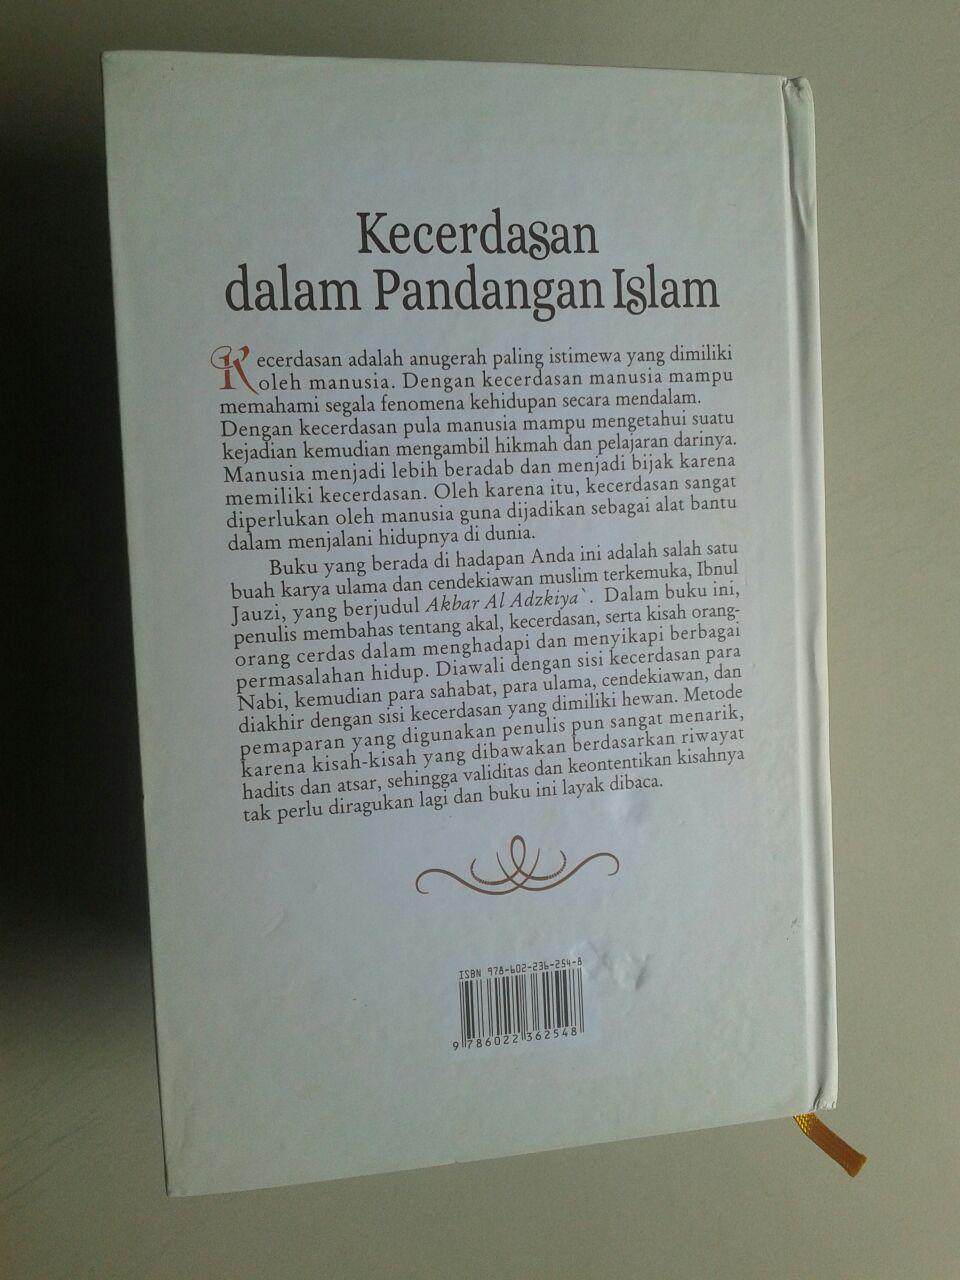 Buku Kecerdasan Dalam Pandangan Islam cover